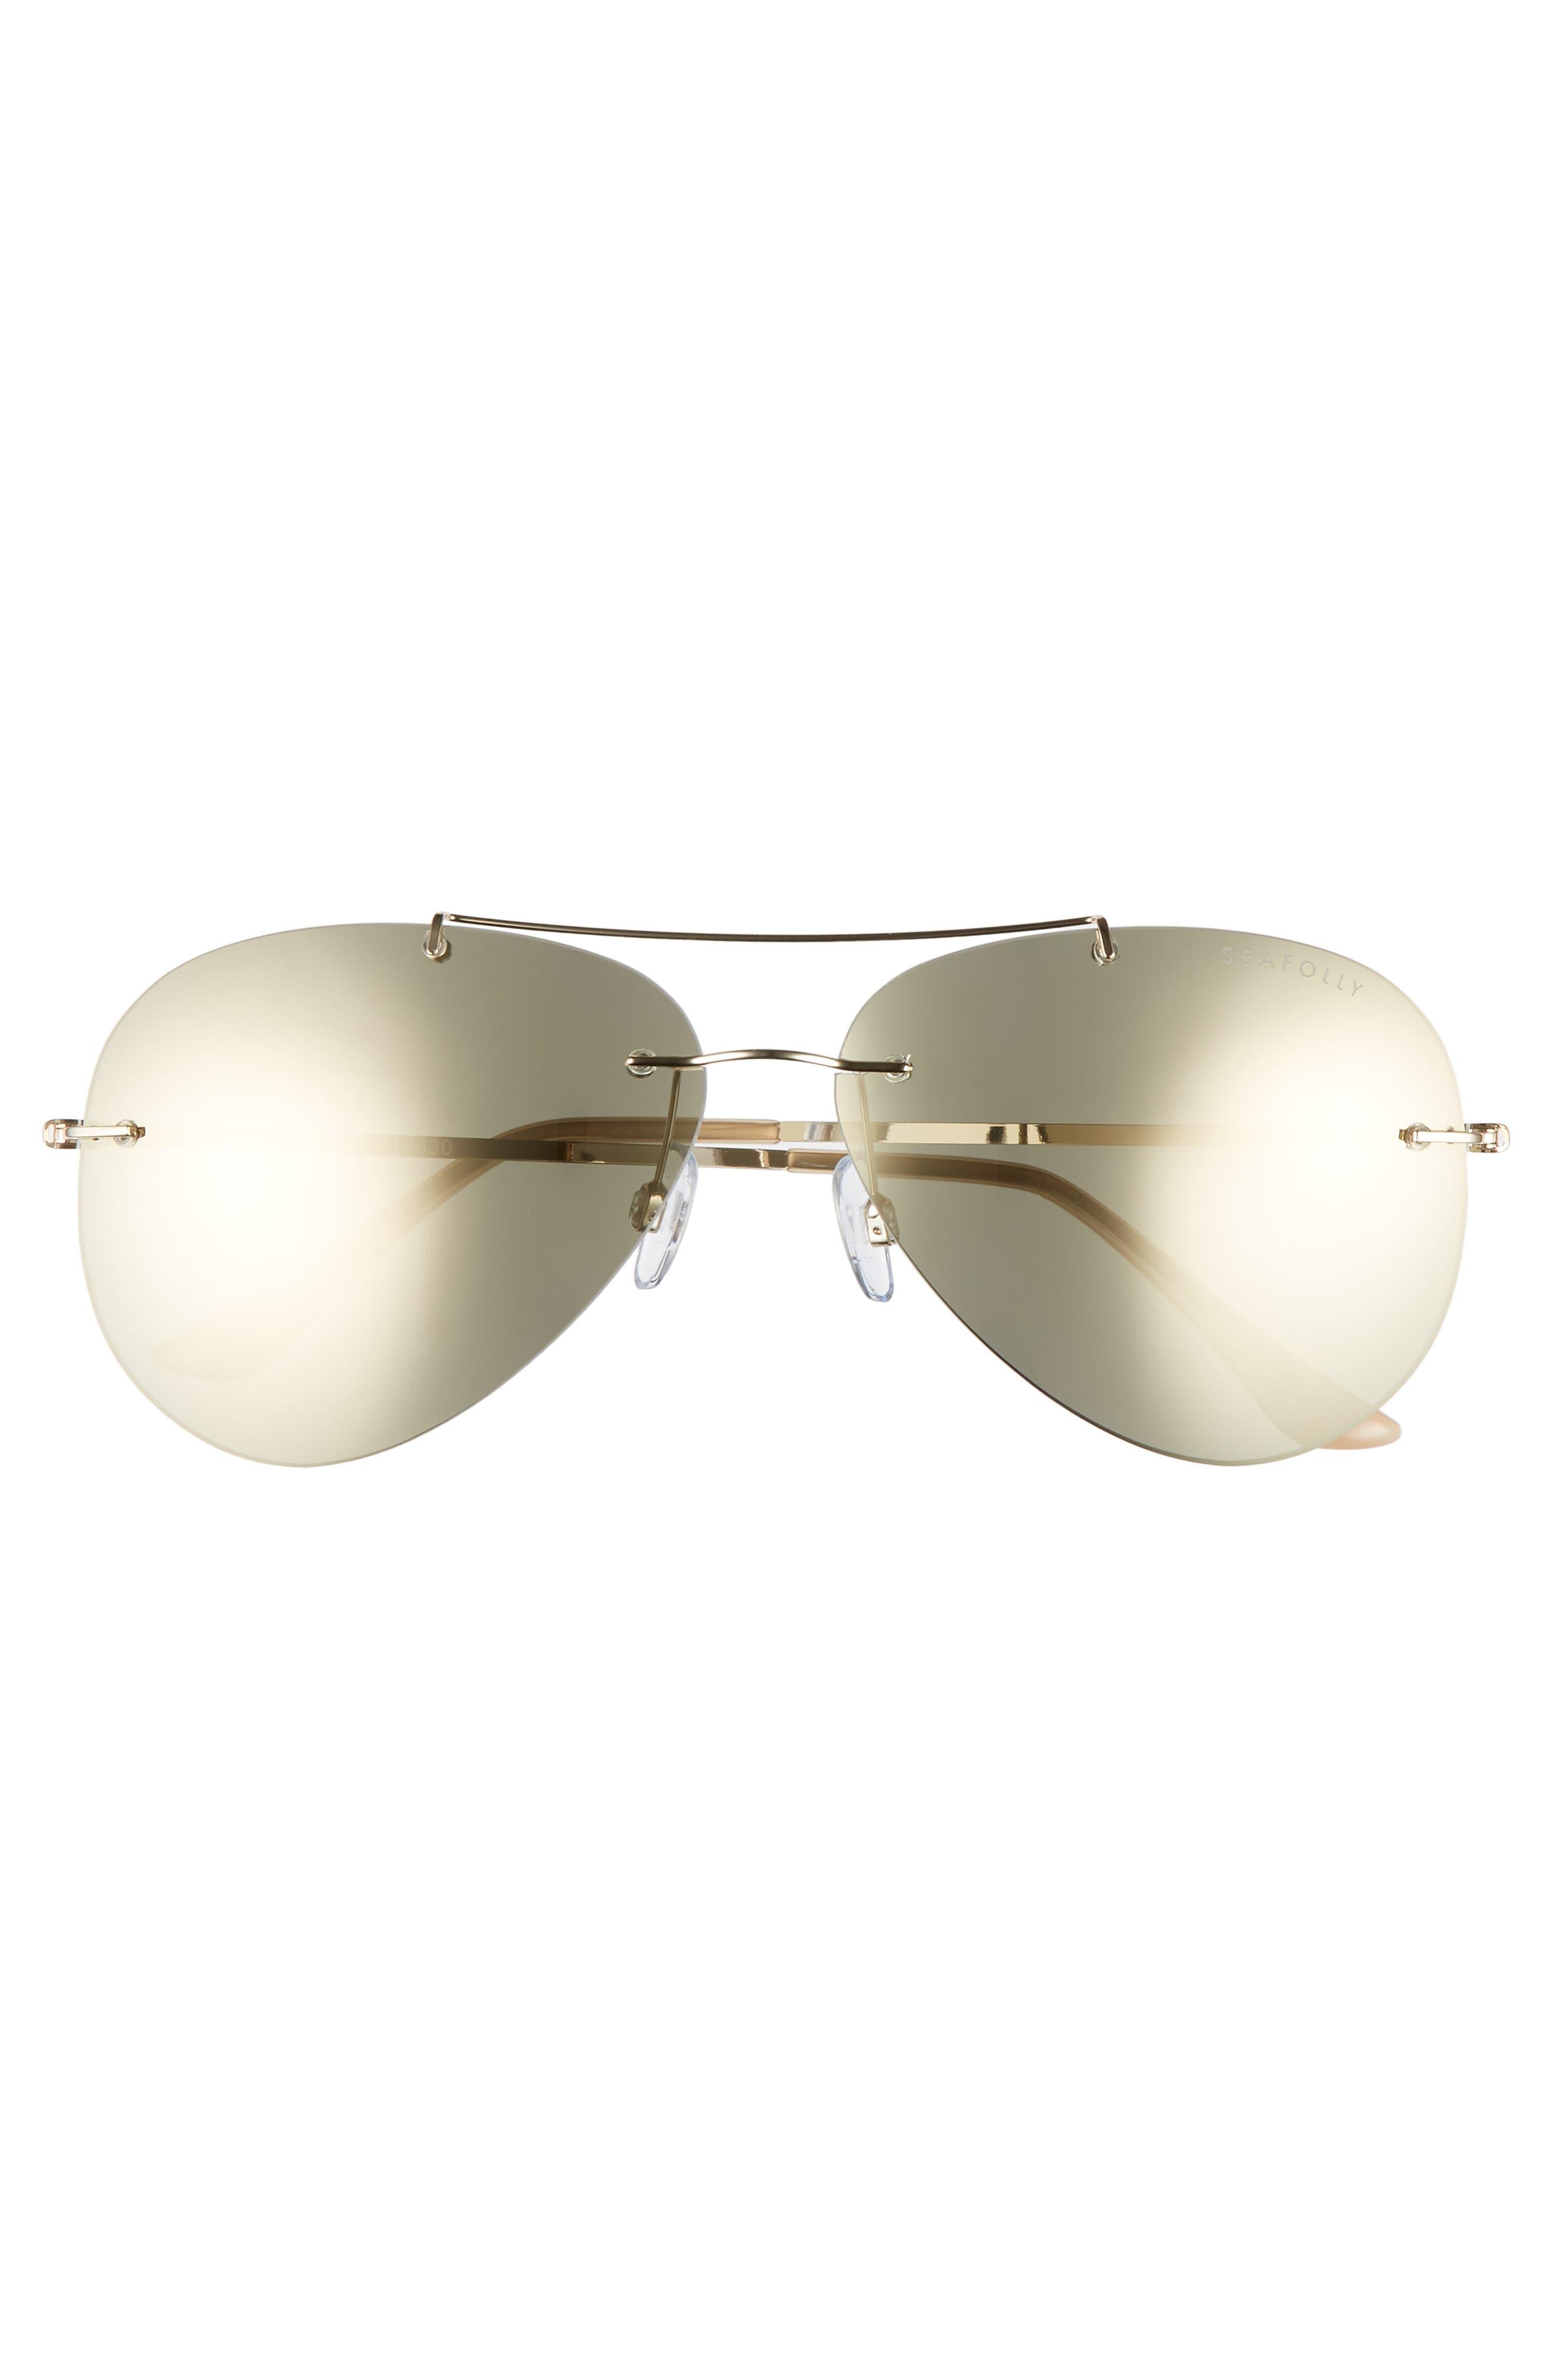 SEAFOLLY,                             Redondo 61mm Rimless Aviator Sunglasses,                             Alternate thumbnail 3, color,                             710